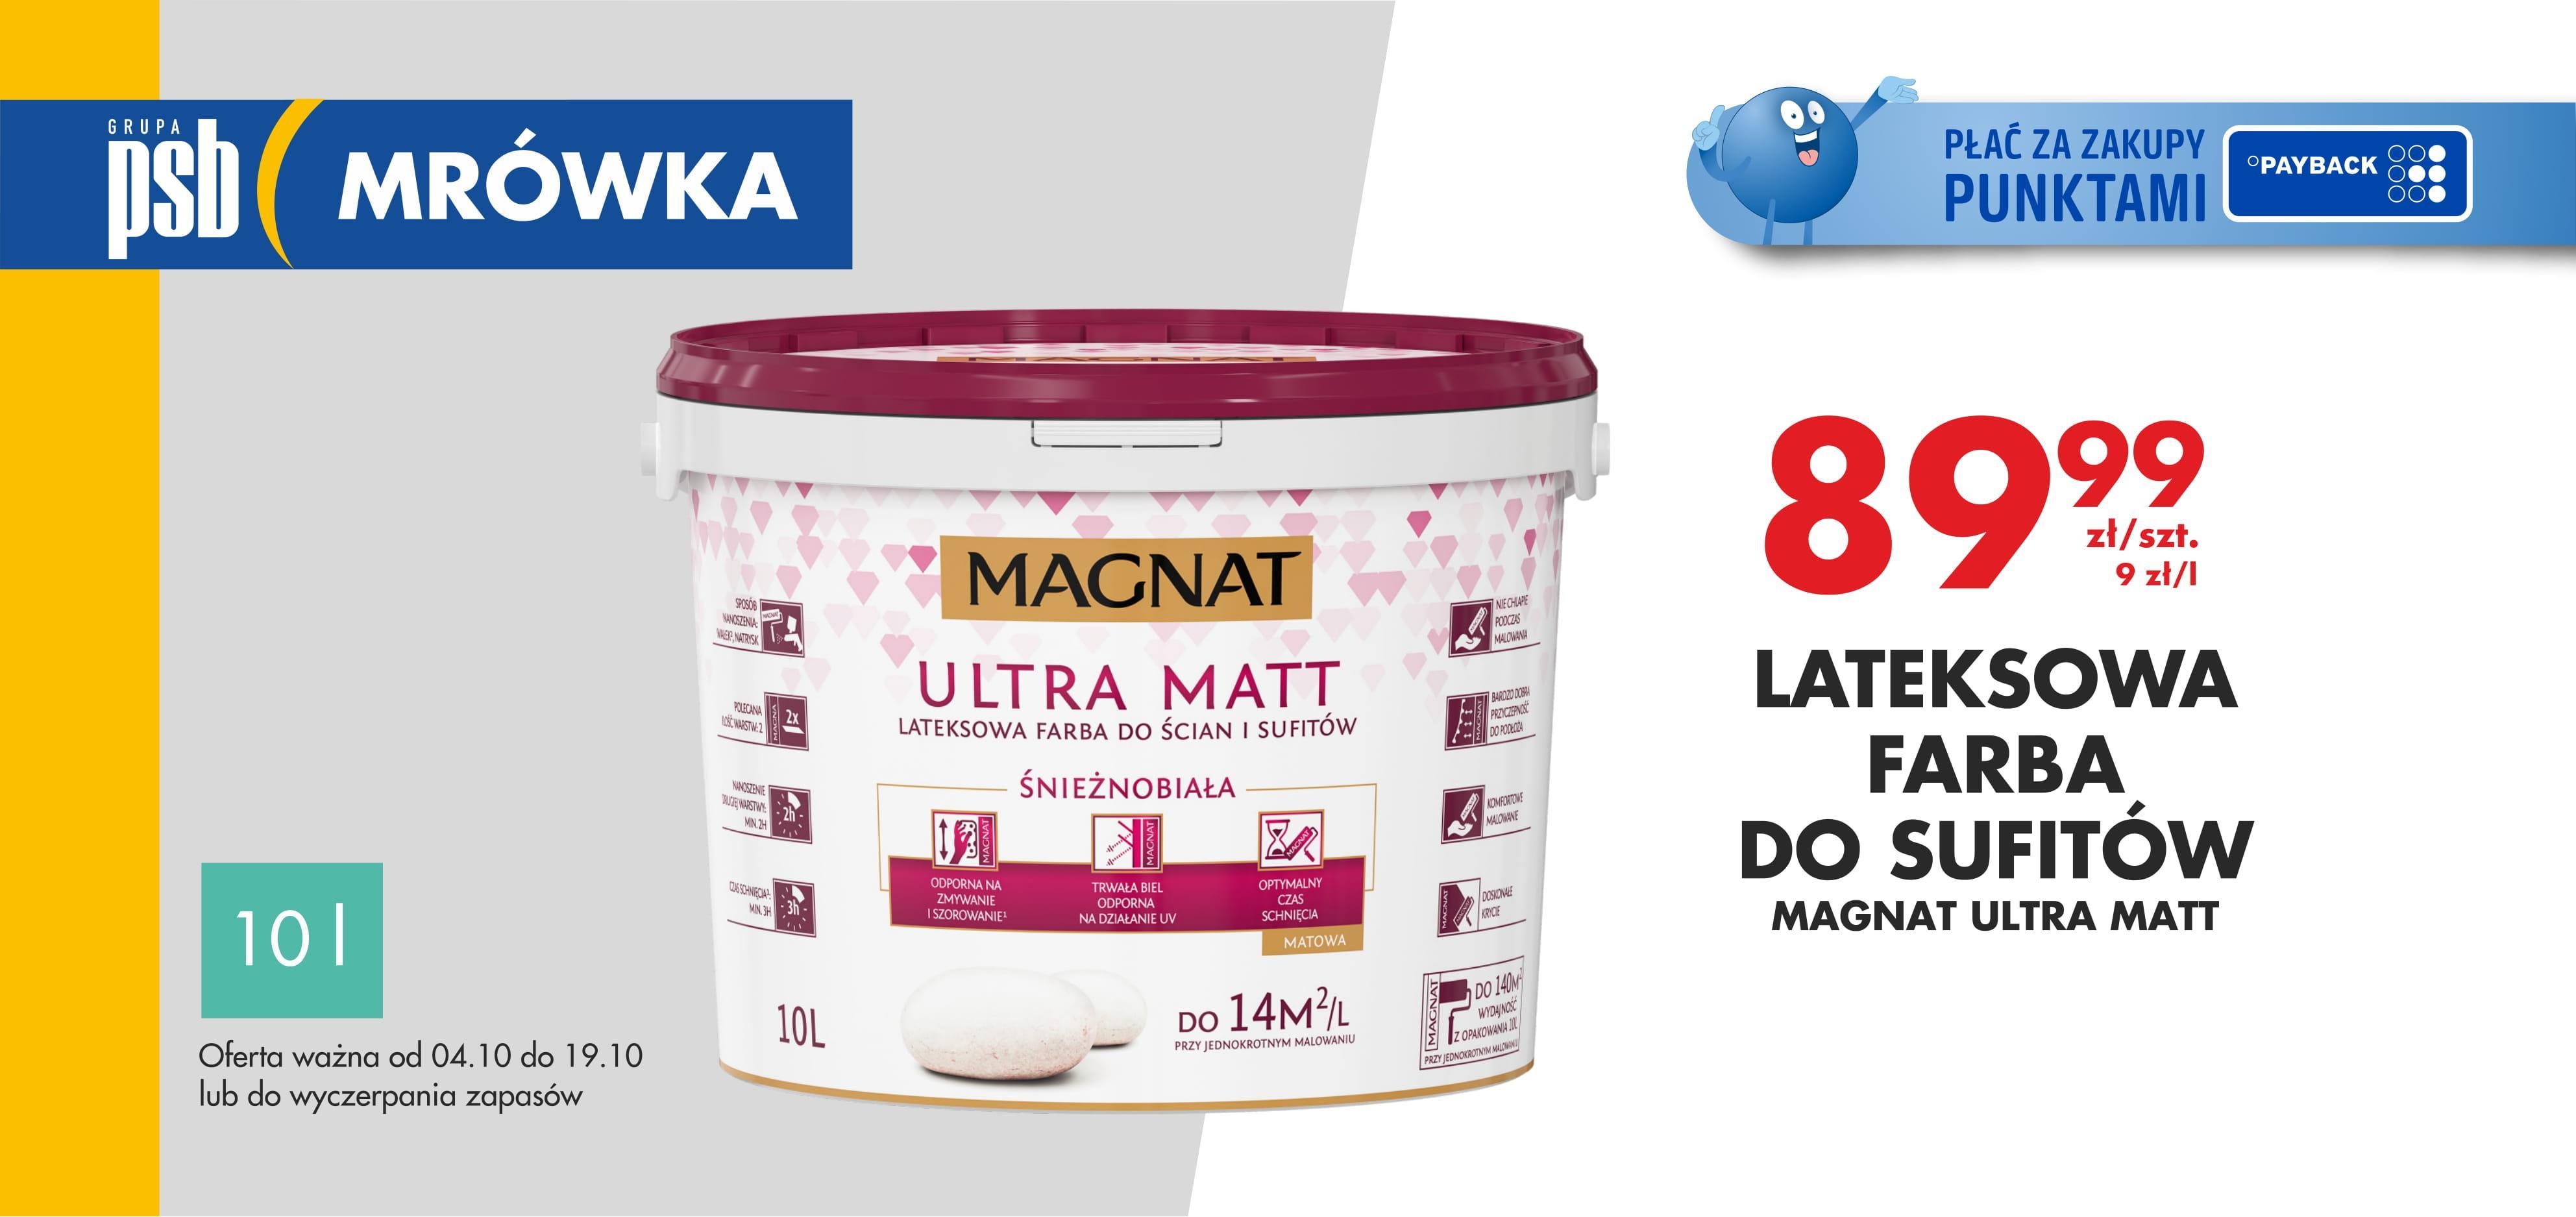 Magnat-ultra-matt-504x238-1